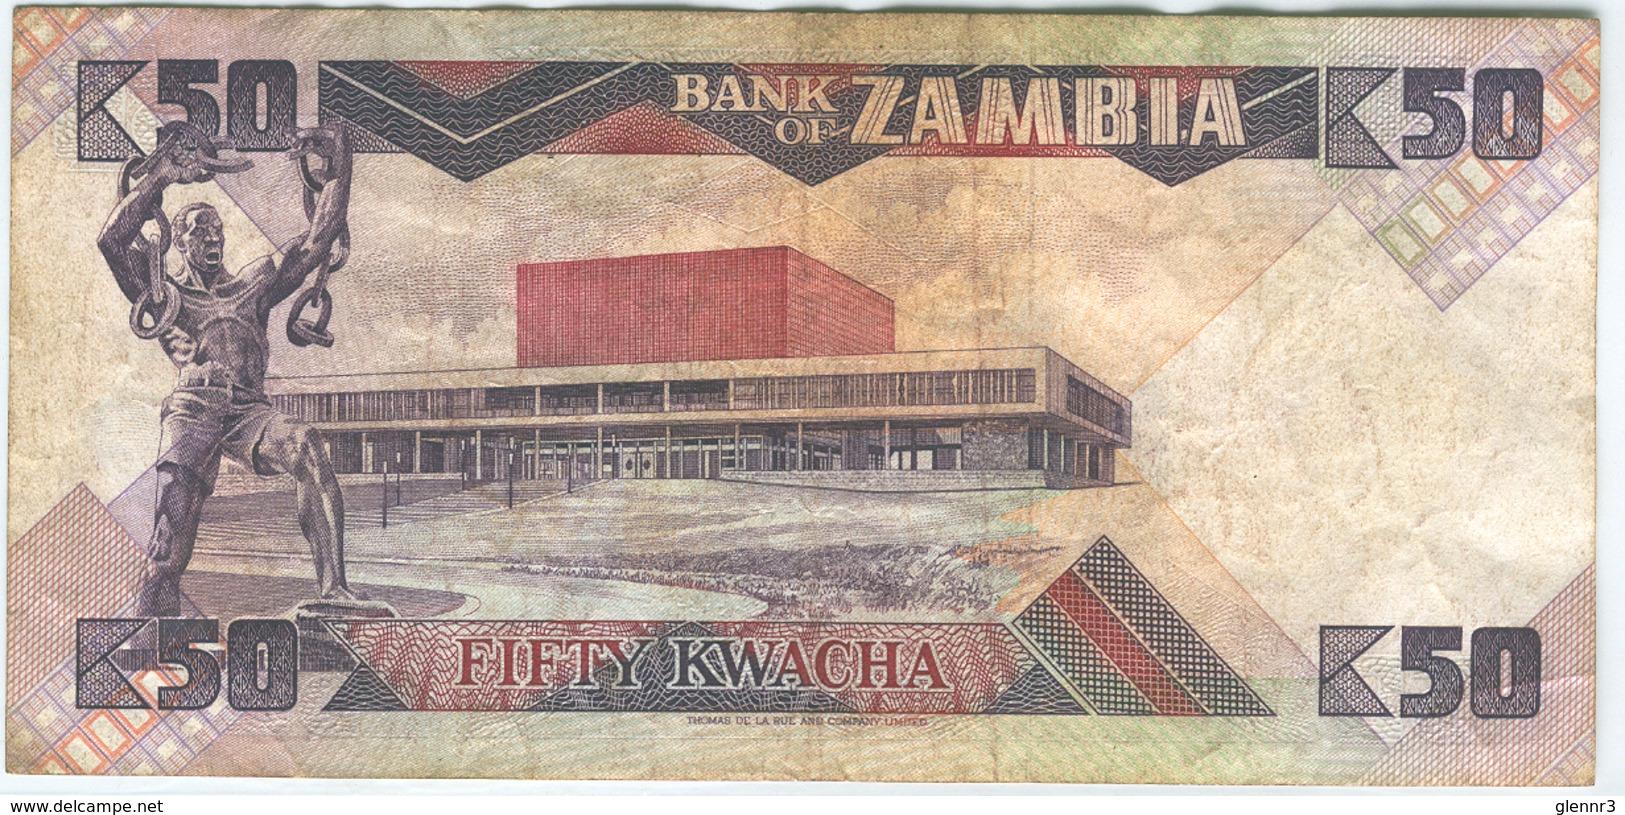 ZAMBIA 28a 1986-88 50 Kwacha Used Good-Very Good - Zambia